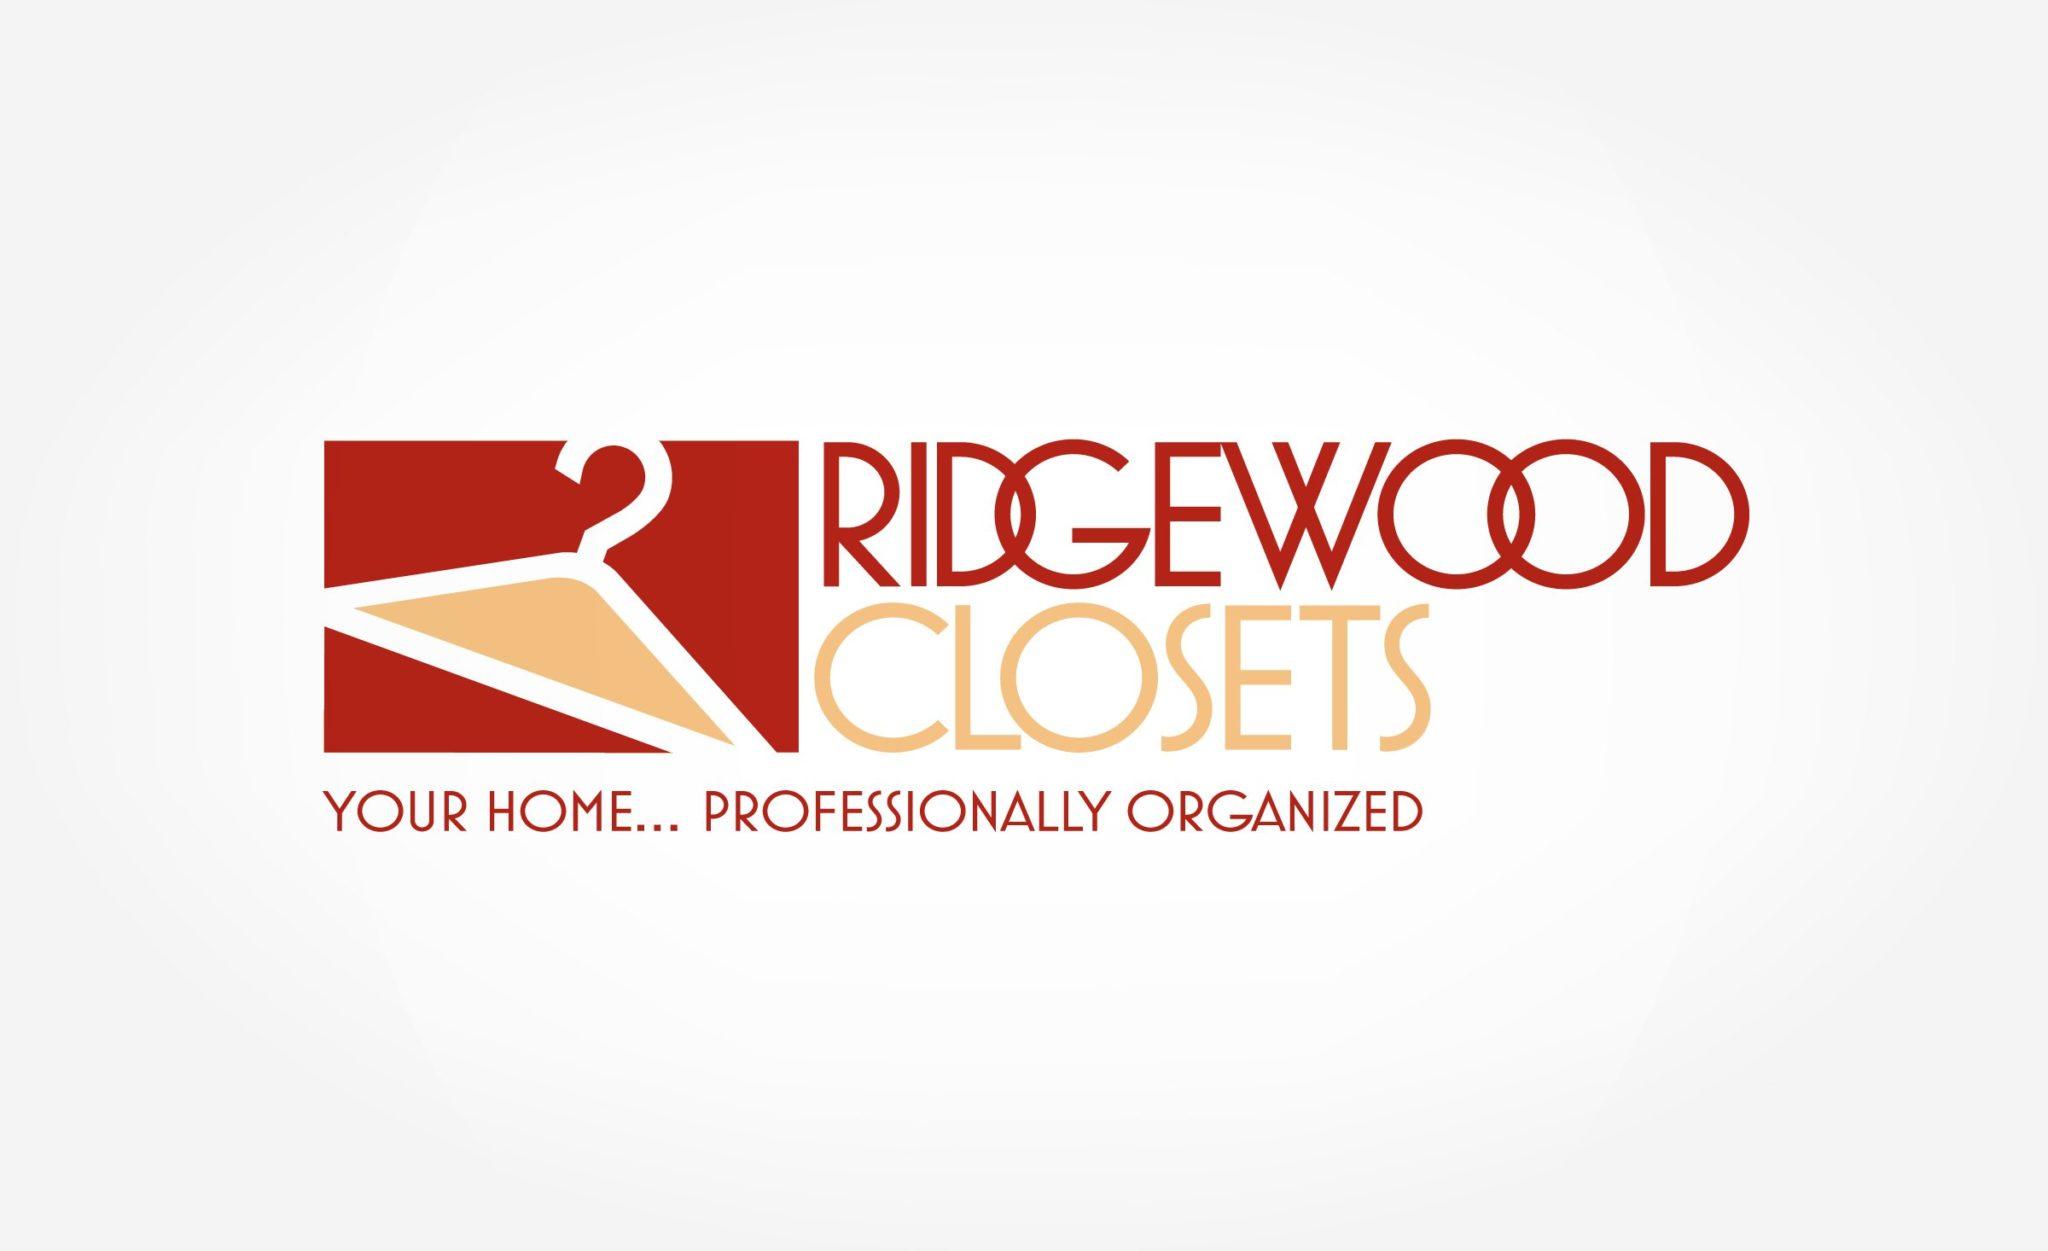 Ridgewood Closets   KickCharge Creative | Kickcharge.com | KickCharge  Creative | Kickcharge.com